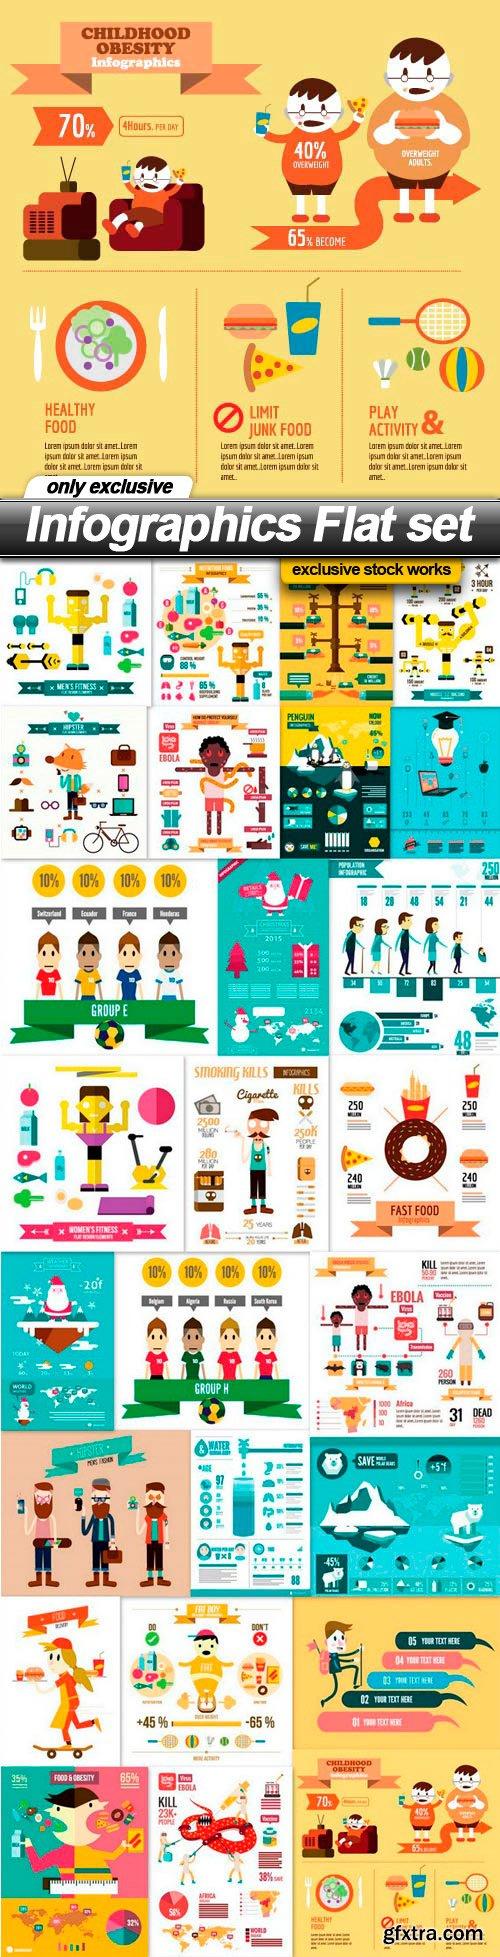 Infographics Flat set - 26 EPS